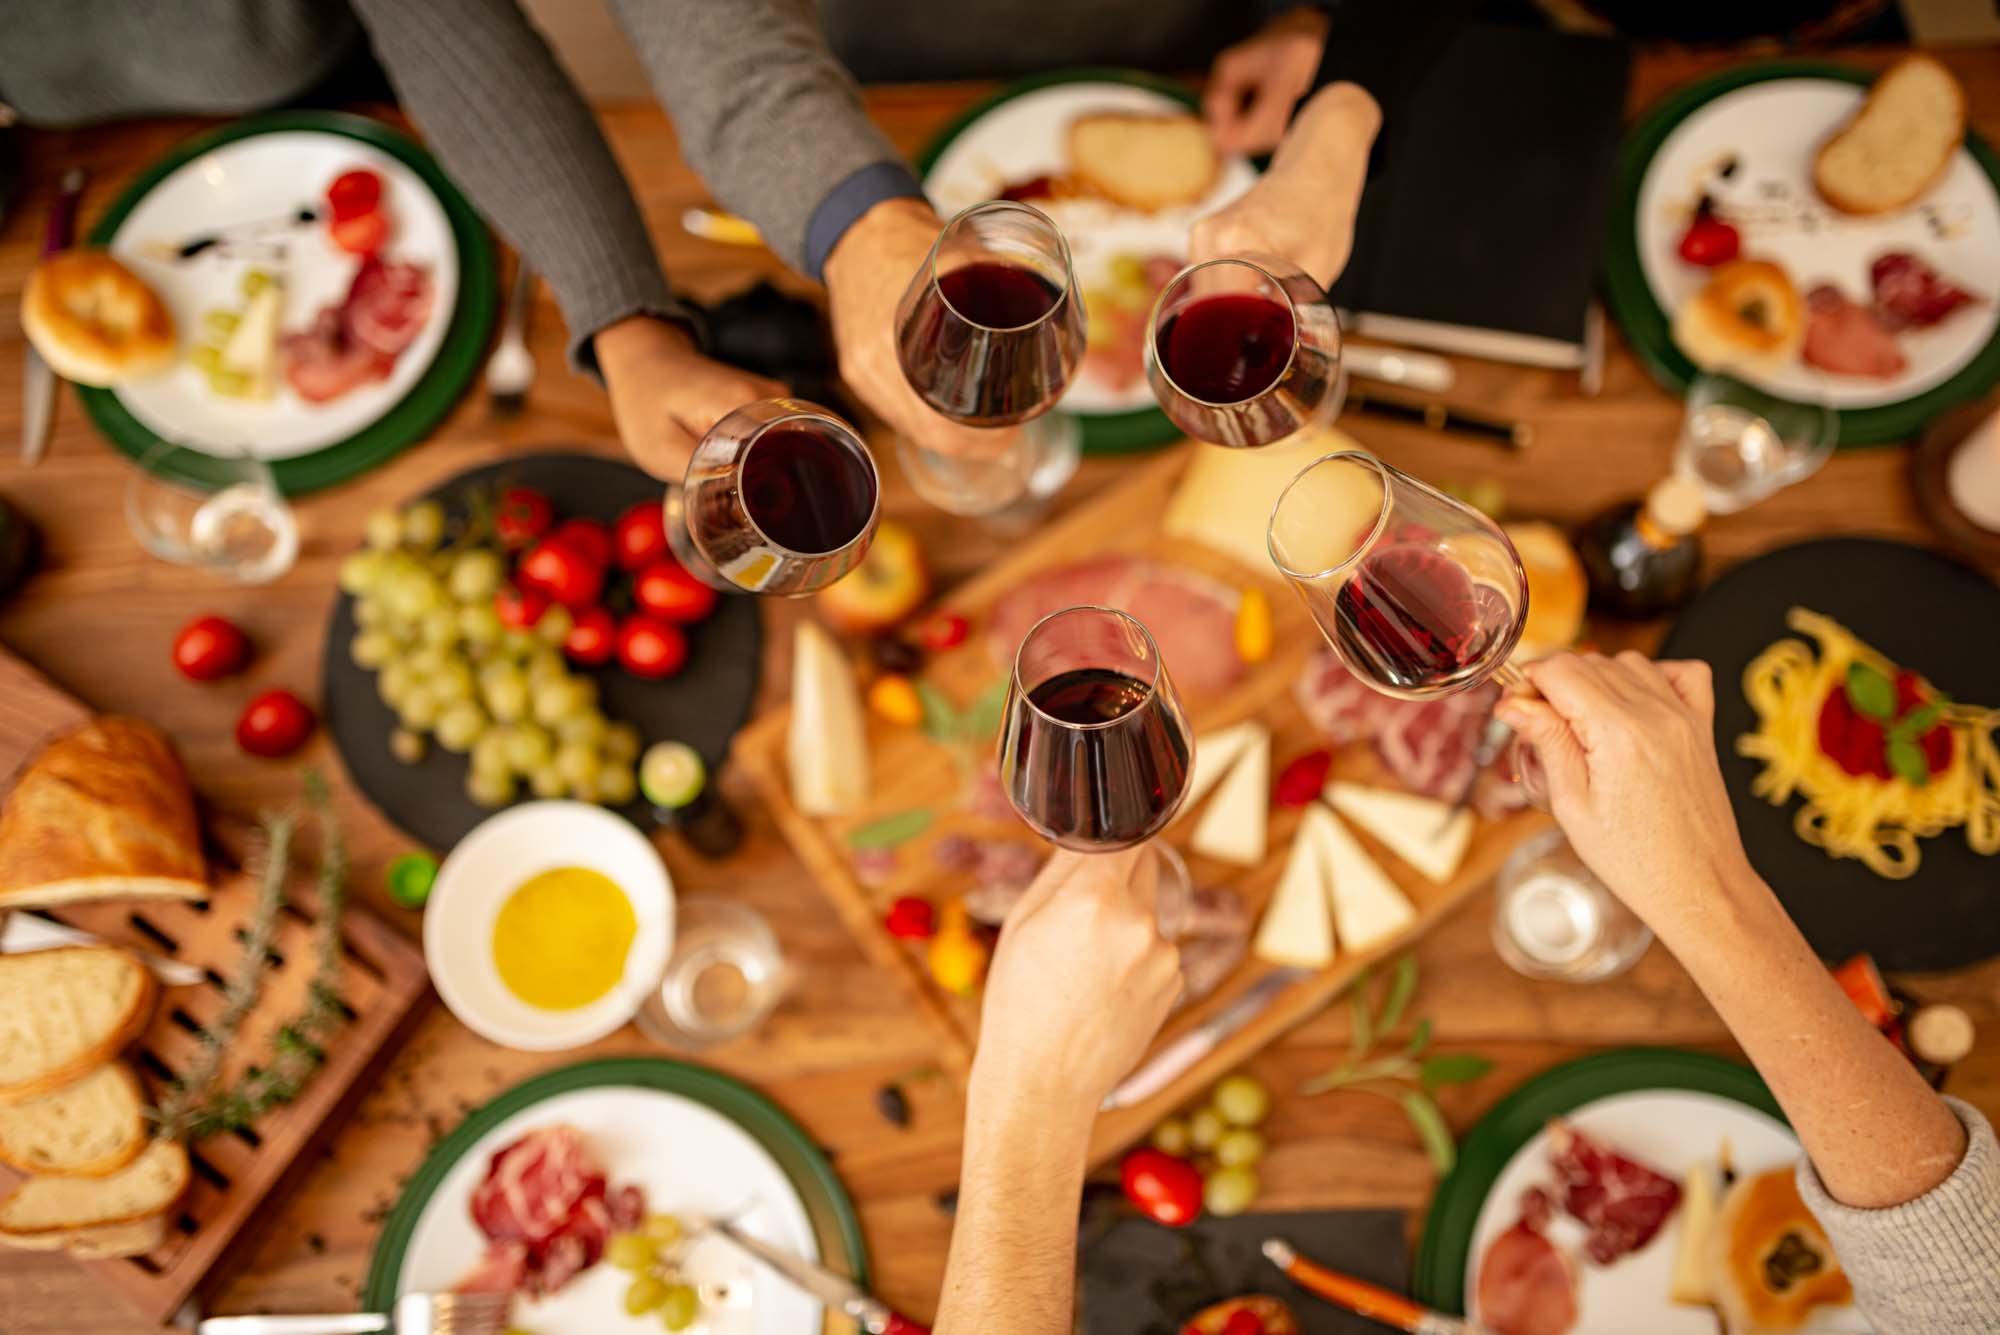 Corsi Di Cucina Formazione Manageriale a Terni